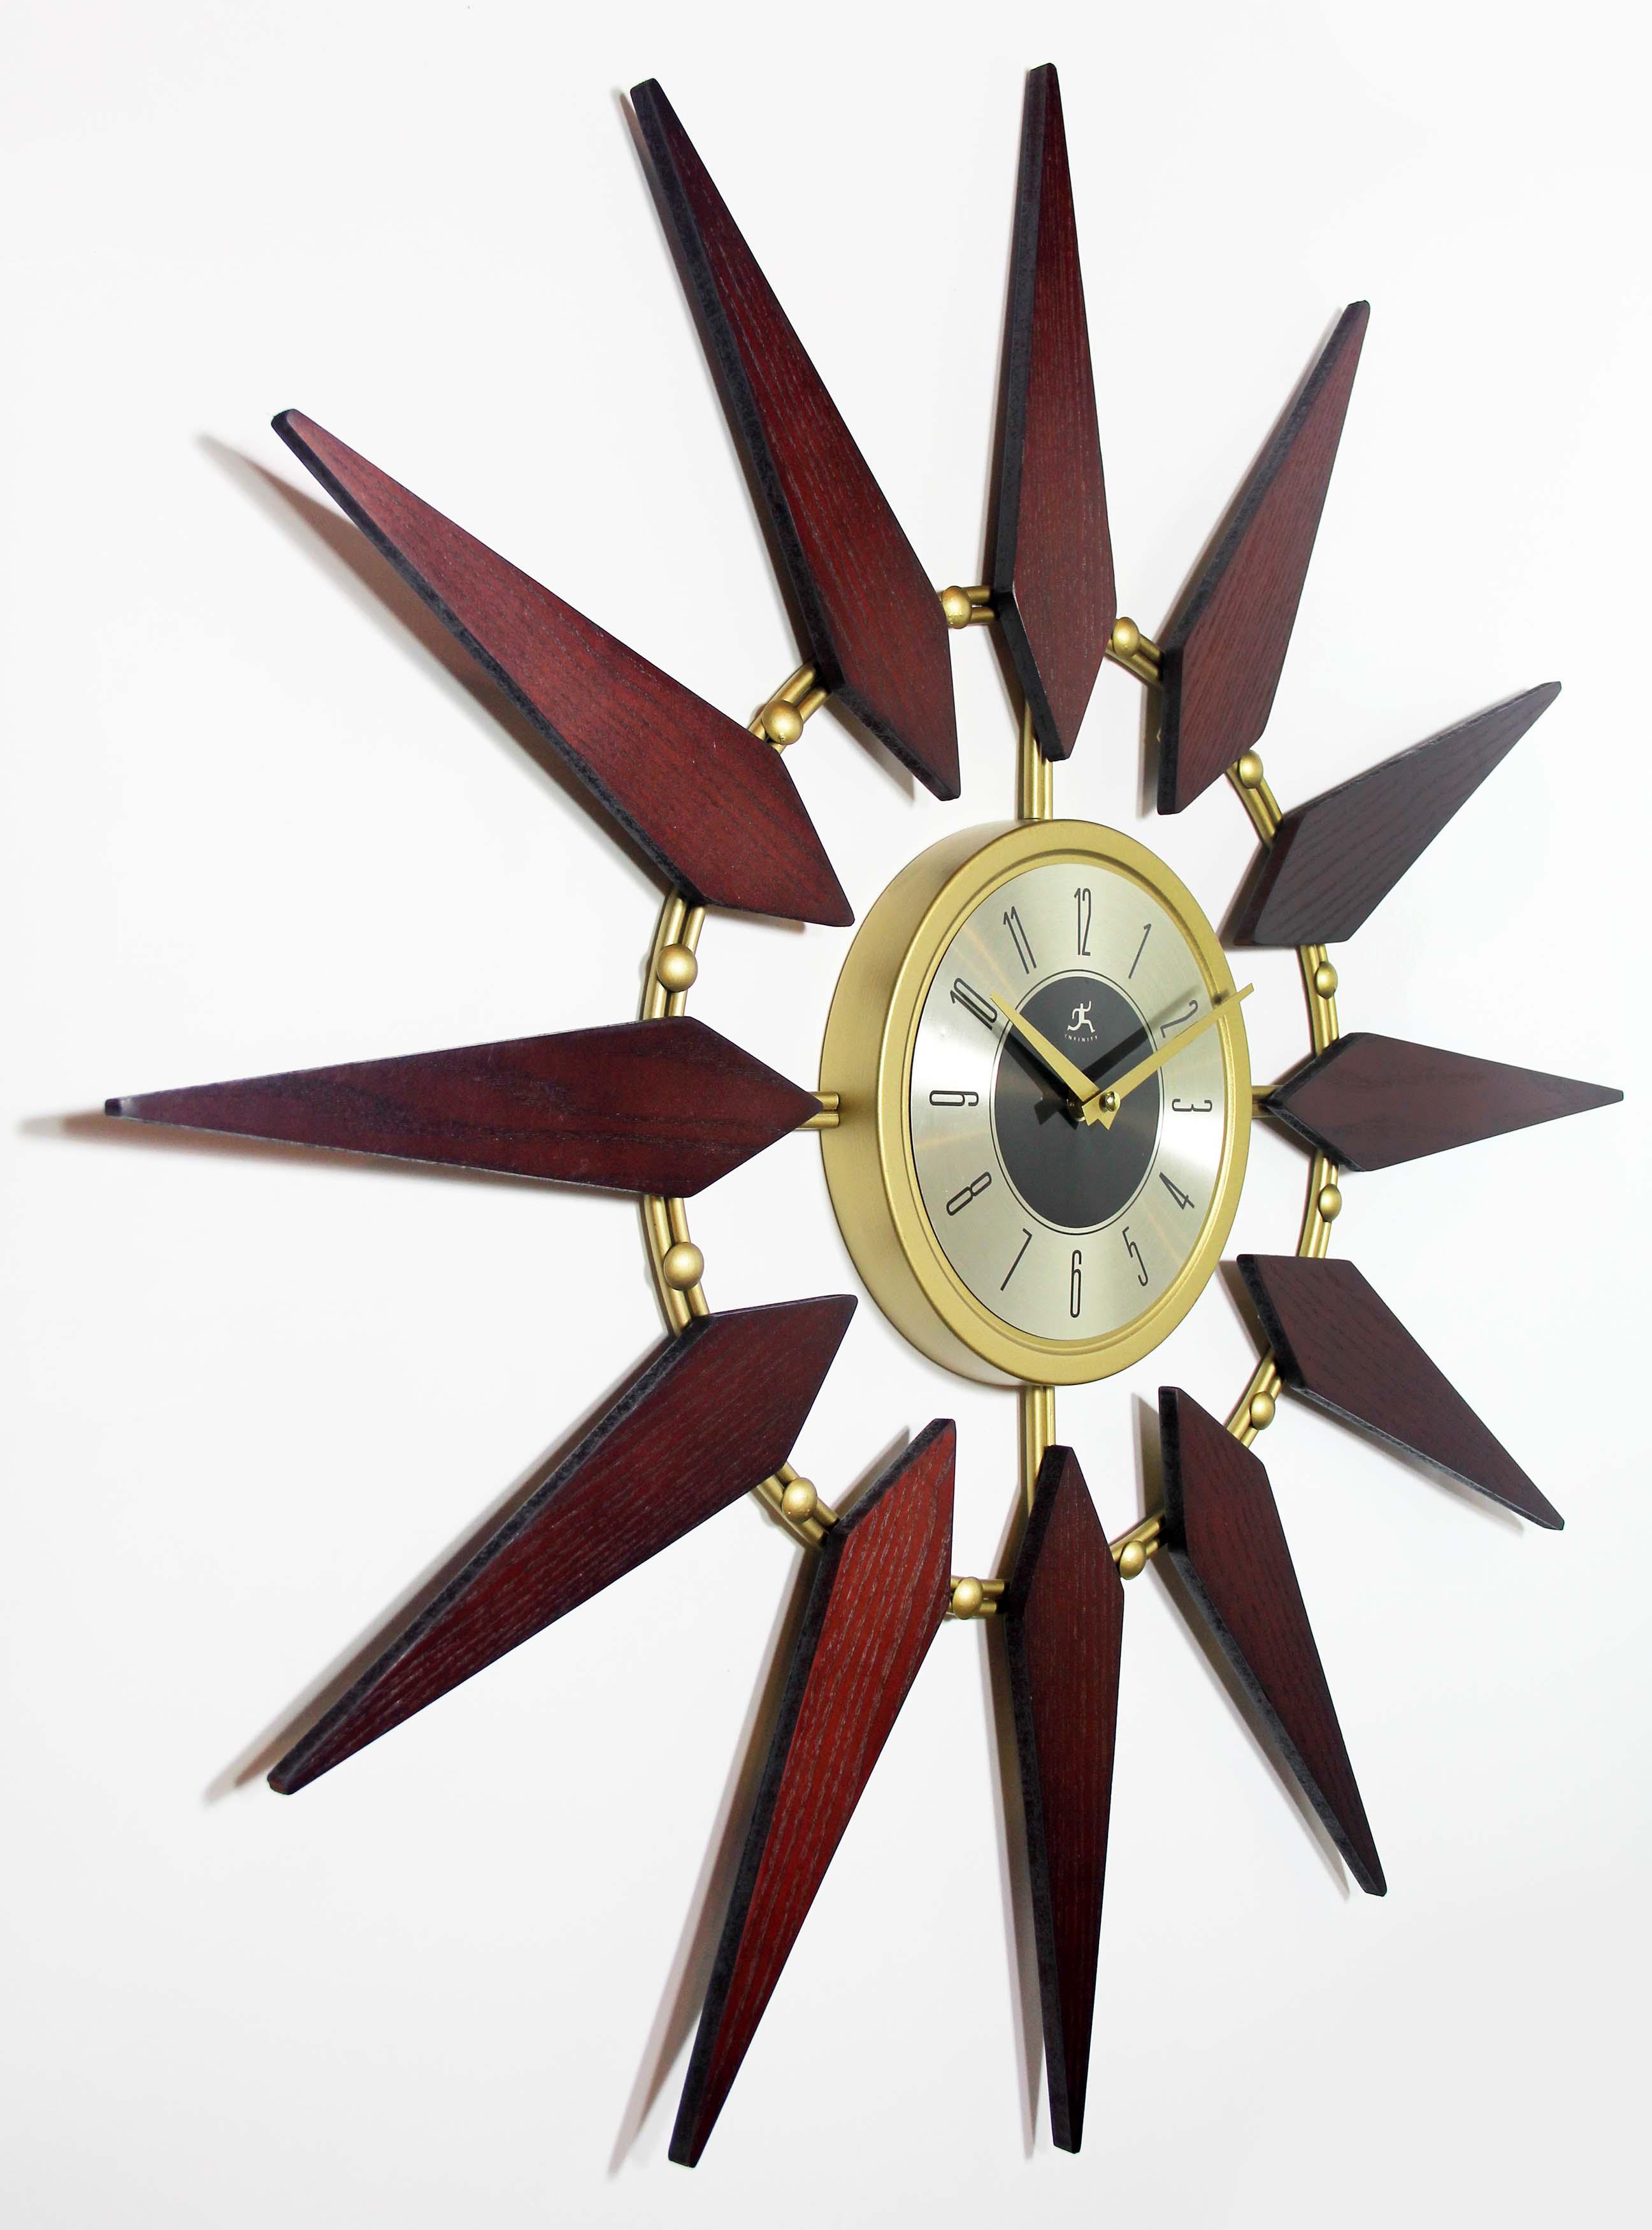 30 Inch Orion Midcentury Walnut Metal Wood Wall Clock